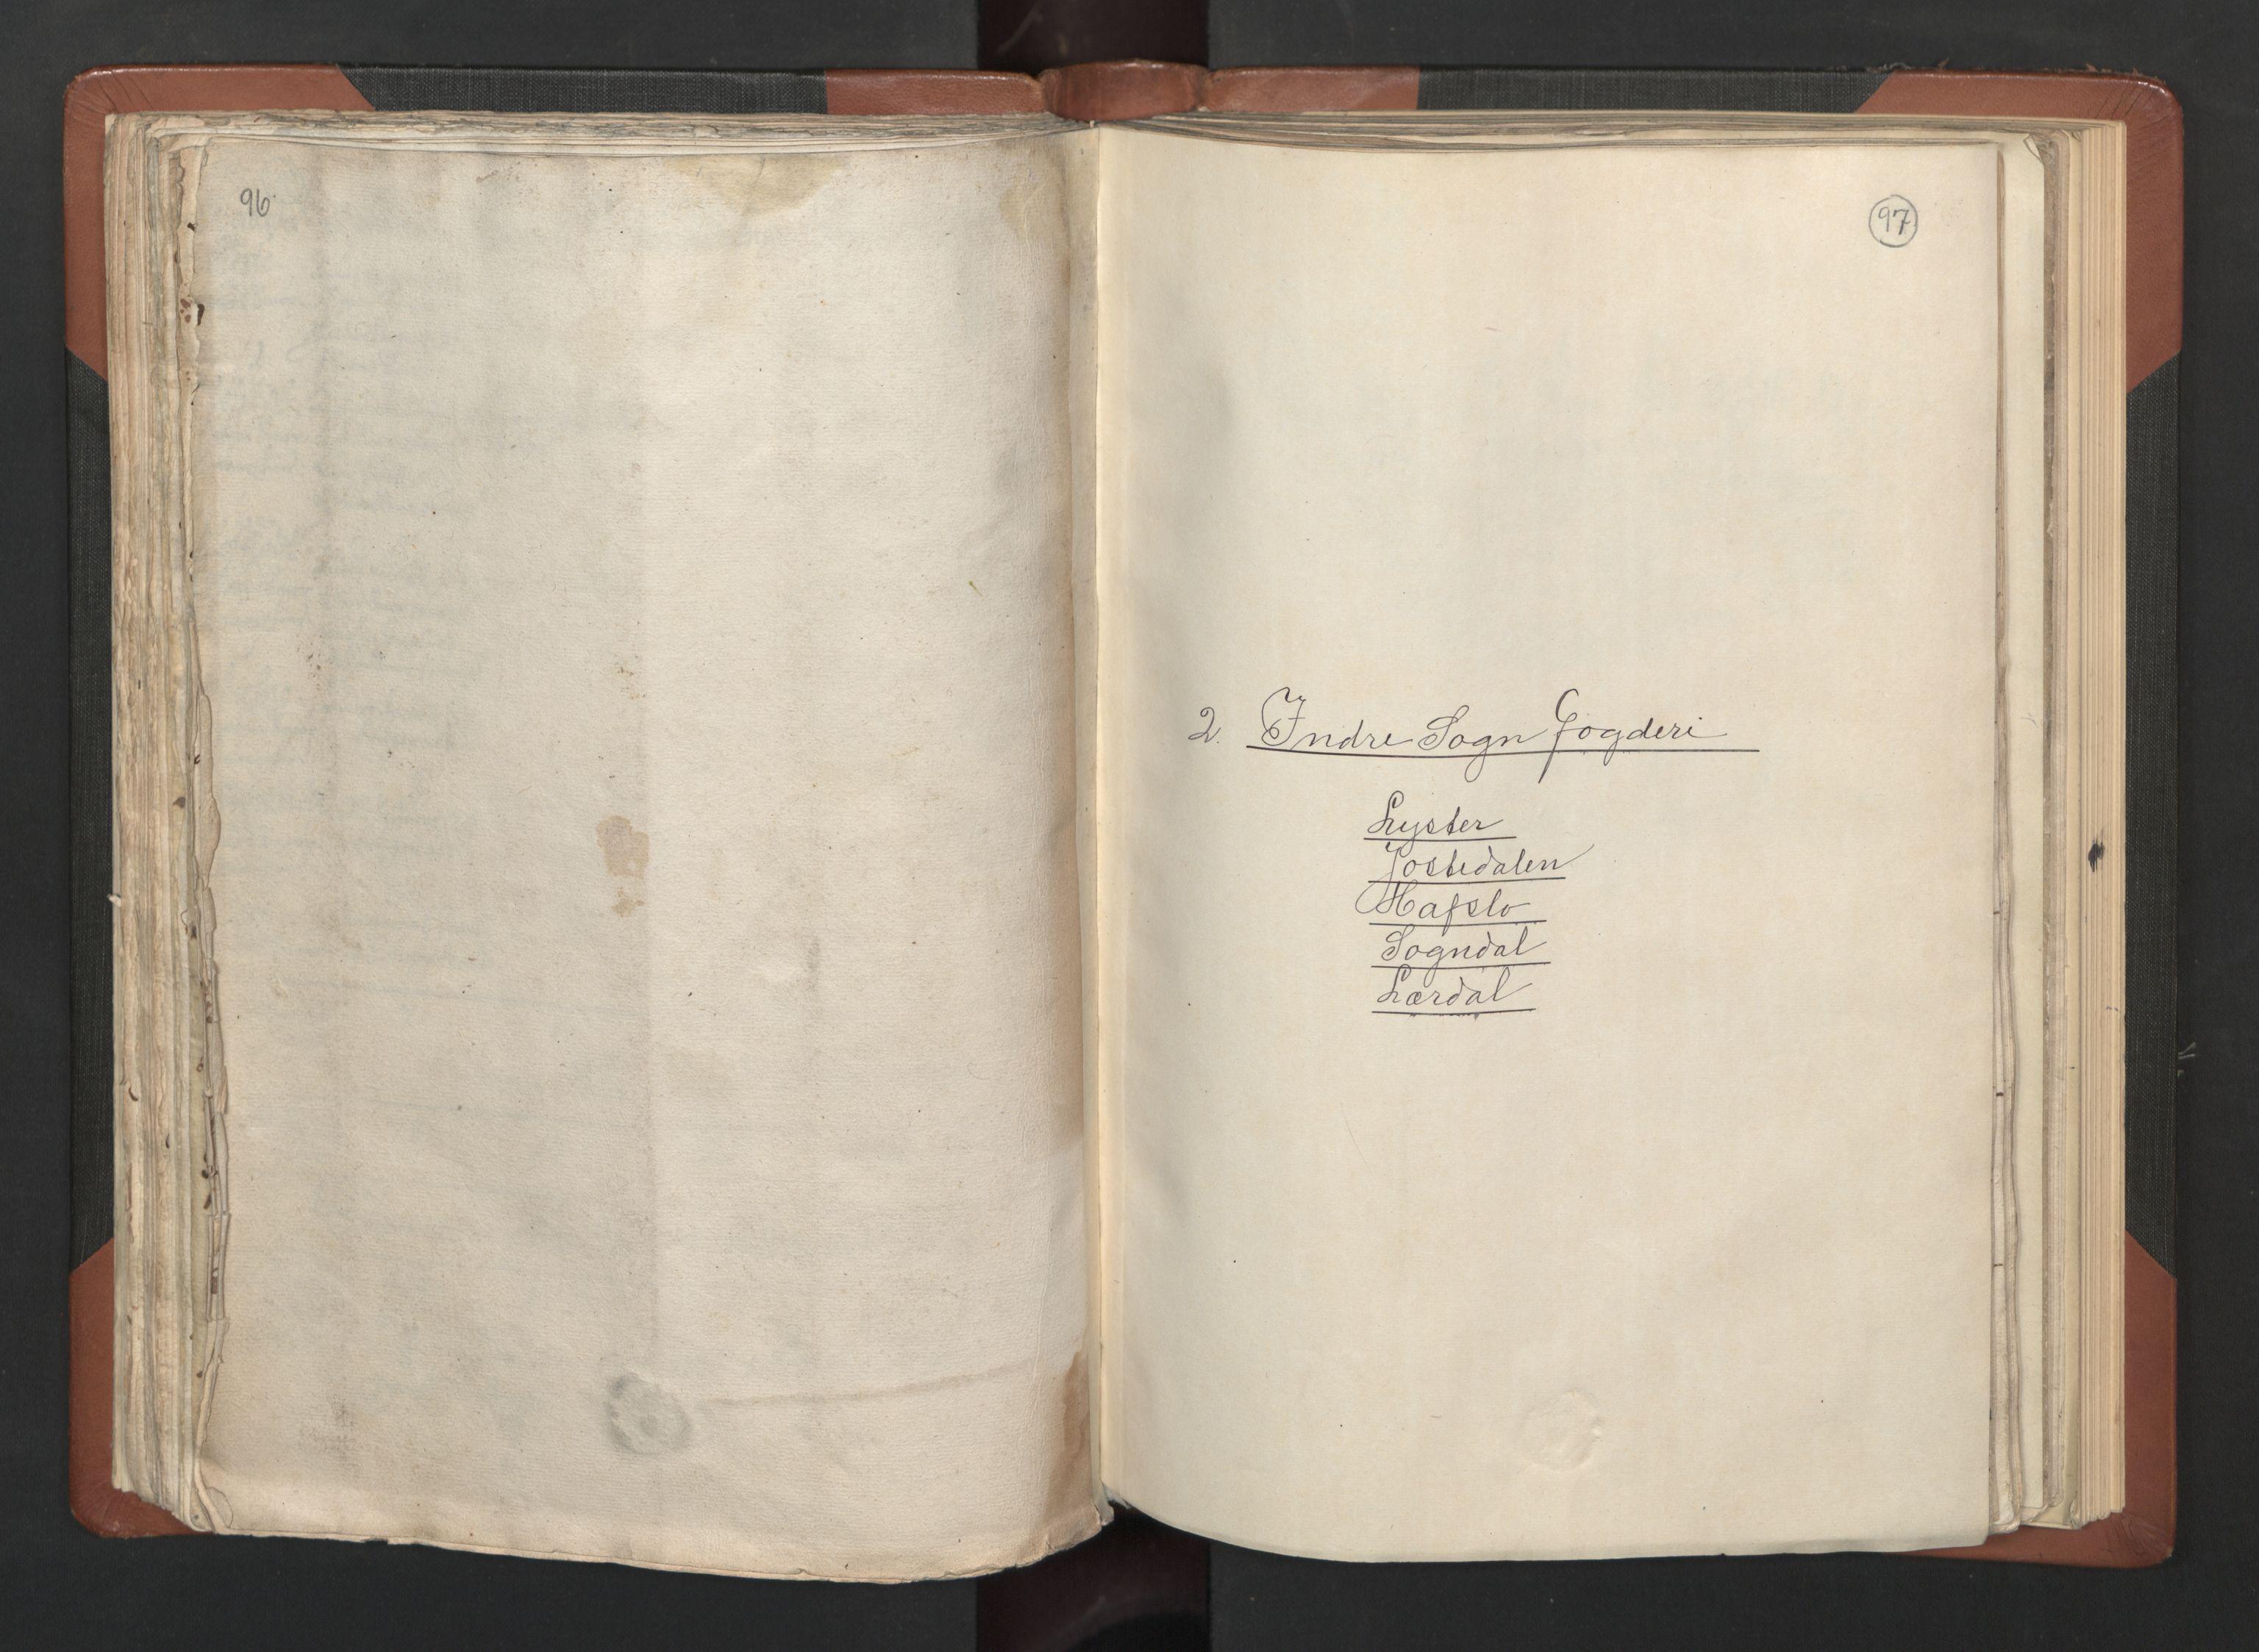 RA, Fogdenes og sorenskrivernes manntall 1664-1666, nr. 14: Hardanger len, Ytre Sogn fogderi og Indre Sogn fogderi, 1664-1665, s. 96-97